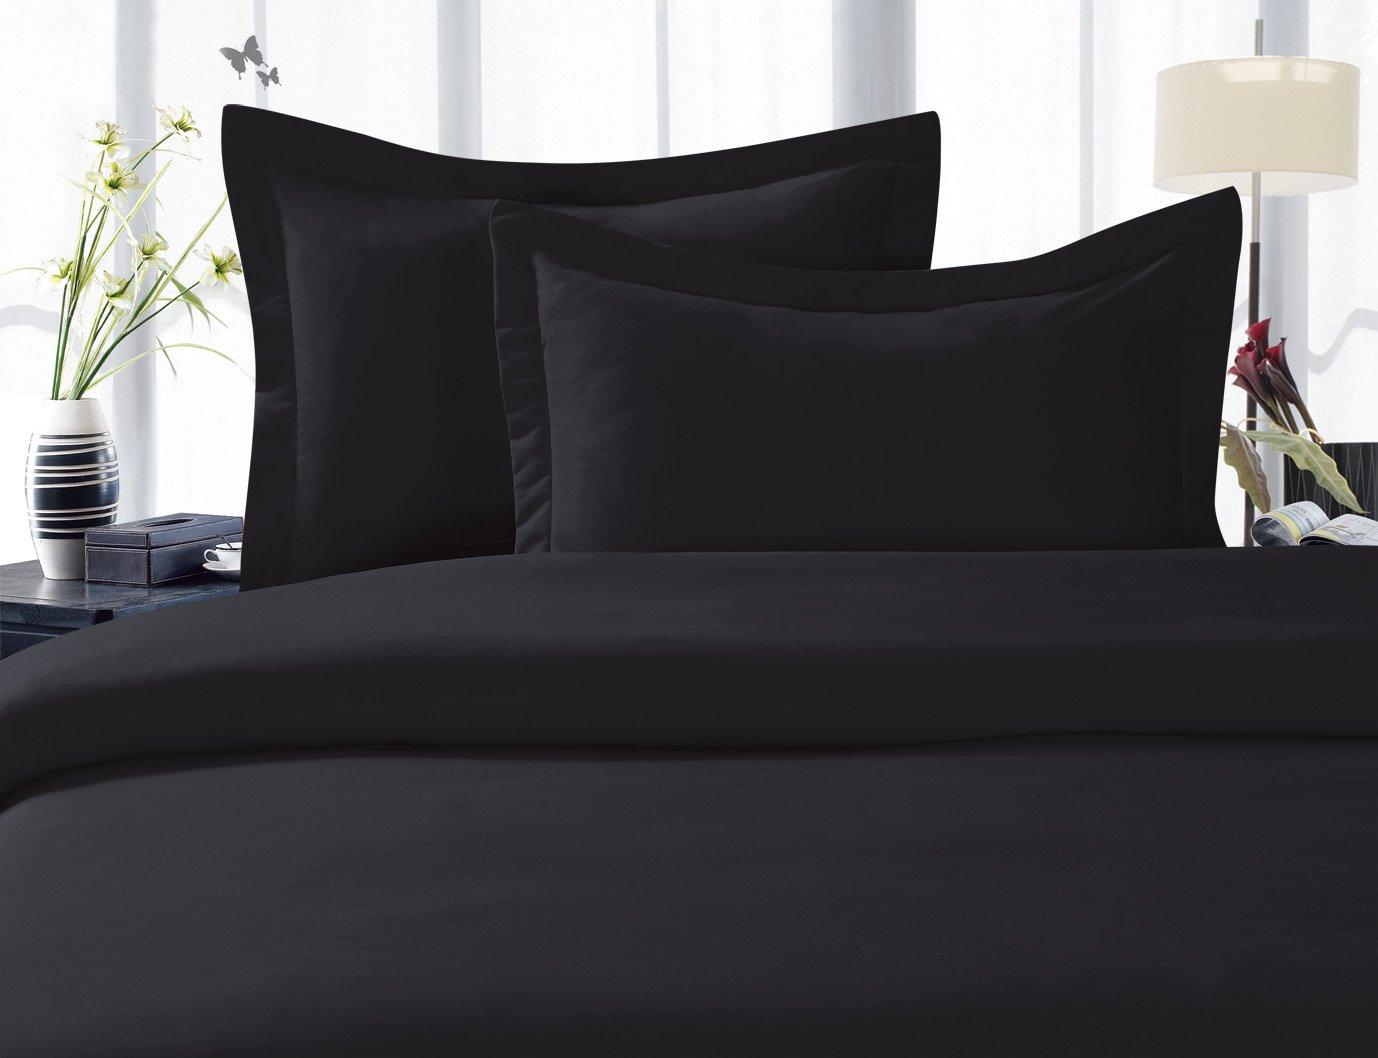 Elegant Comfort 3 Piece Luxurious Ultra Soft Egyptian Quality Coziest Duvet Cover Set, Full/Queen, Black 24RW- DVT Q Black